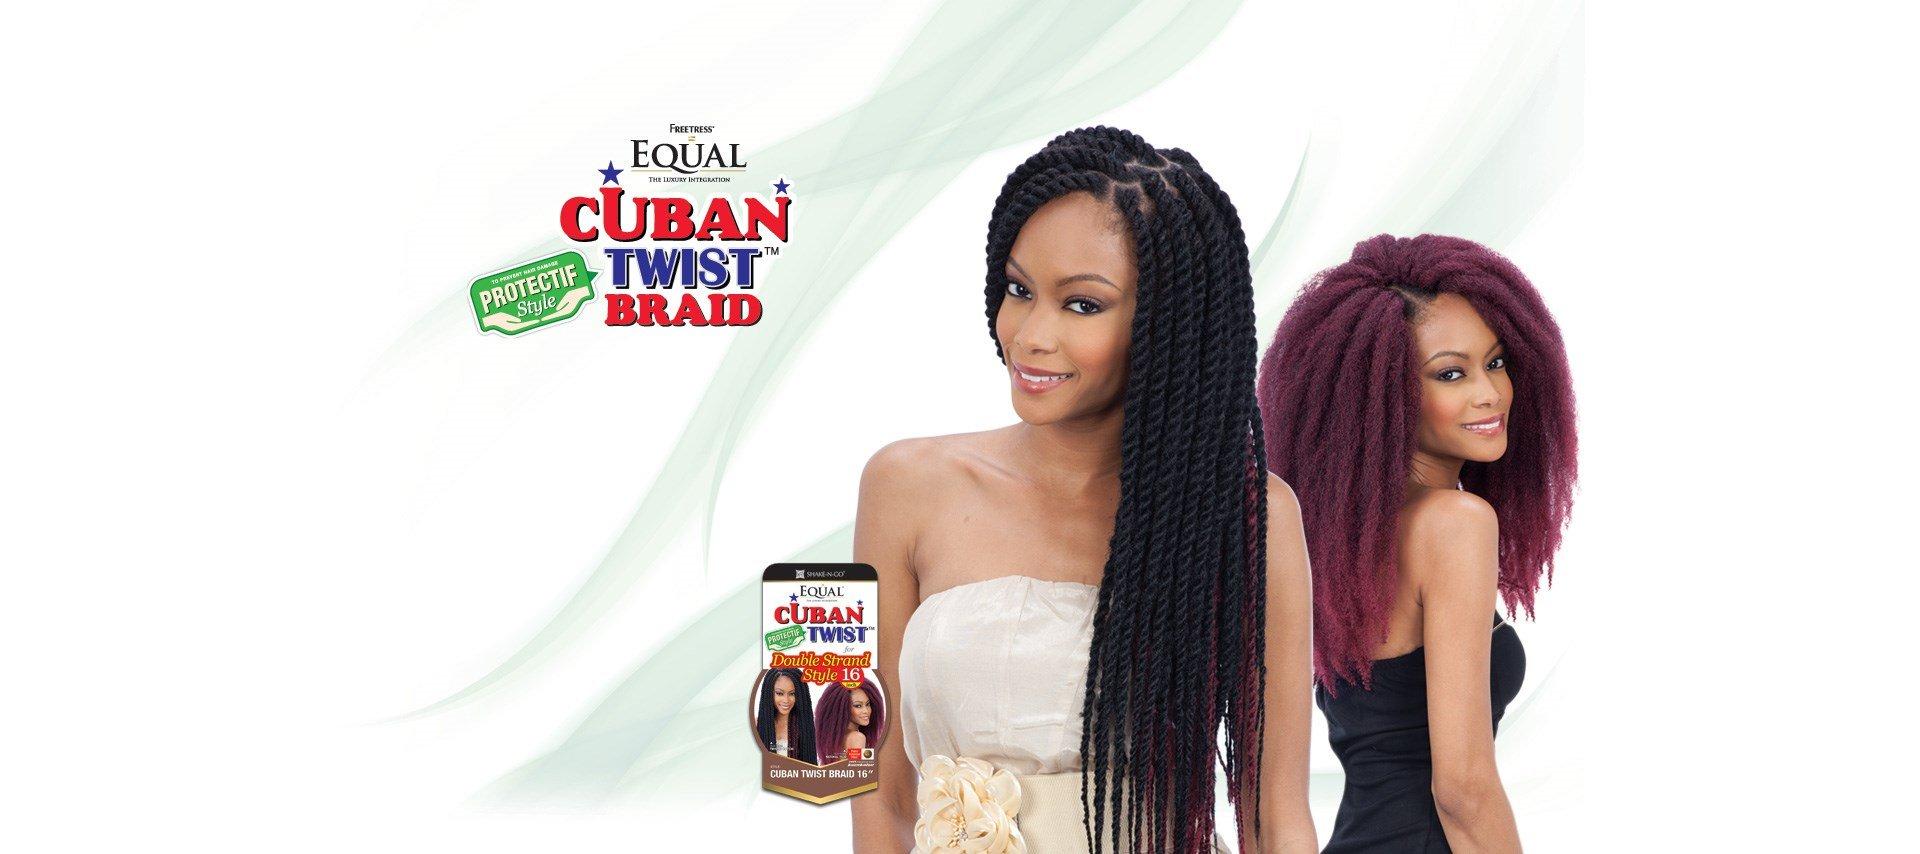 Amazon.com : Freetress Equal Synthetic Hair Braids Havana Twist ...